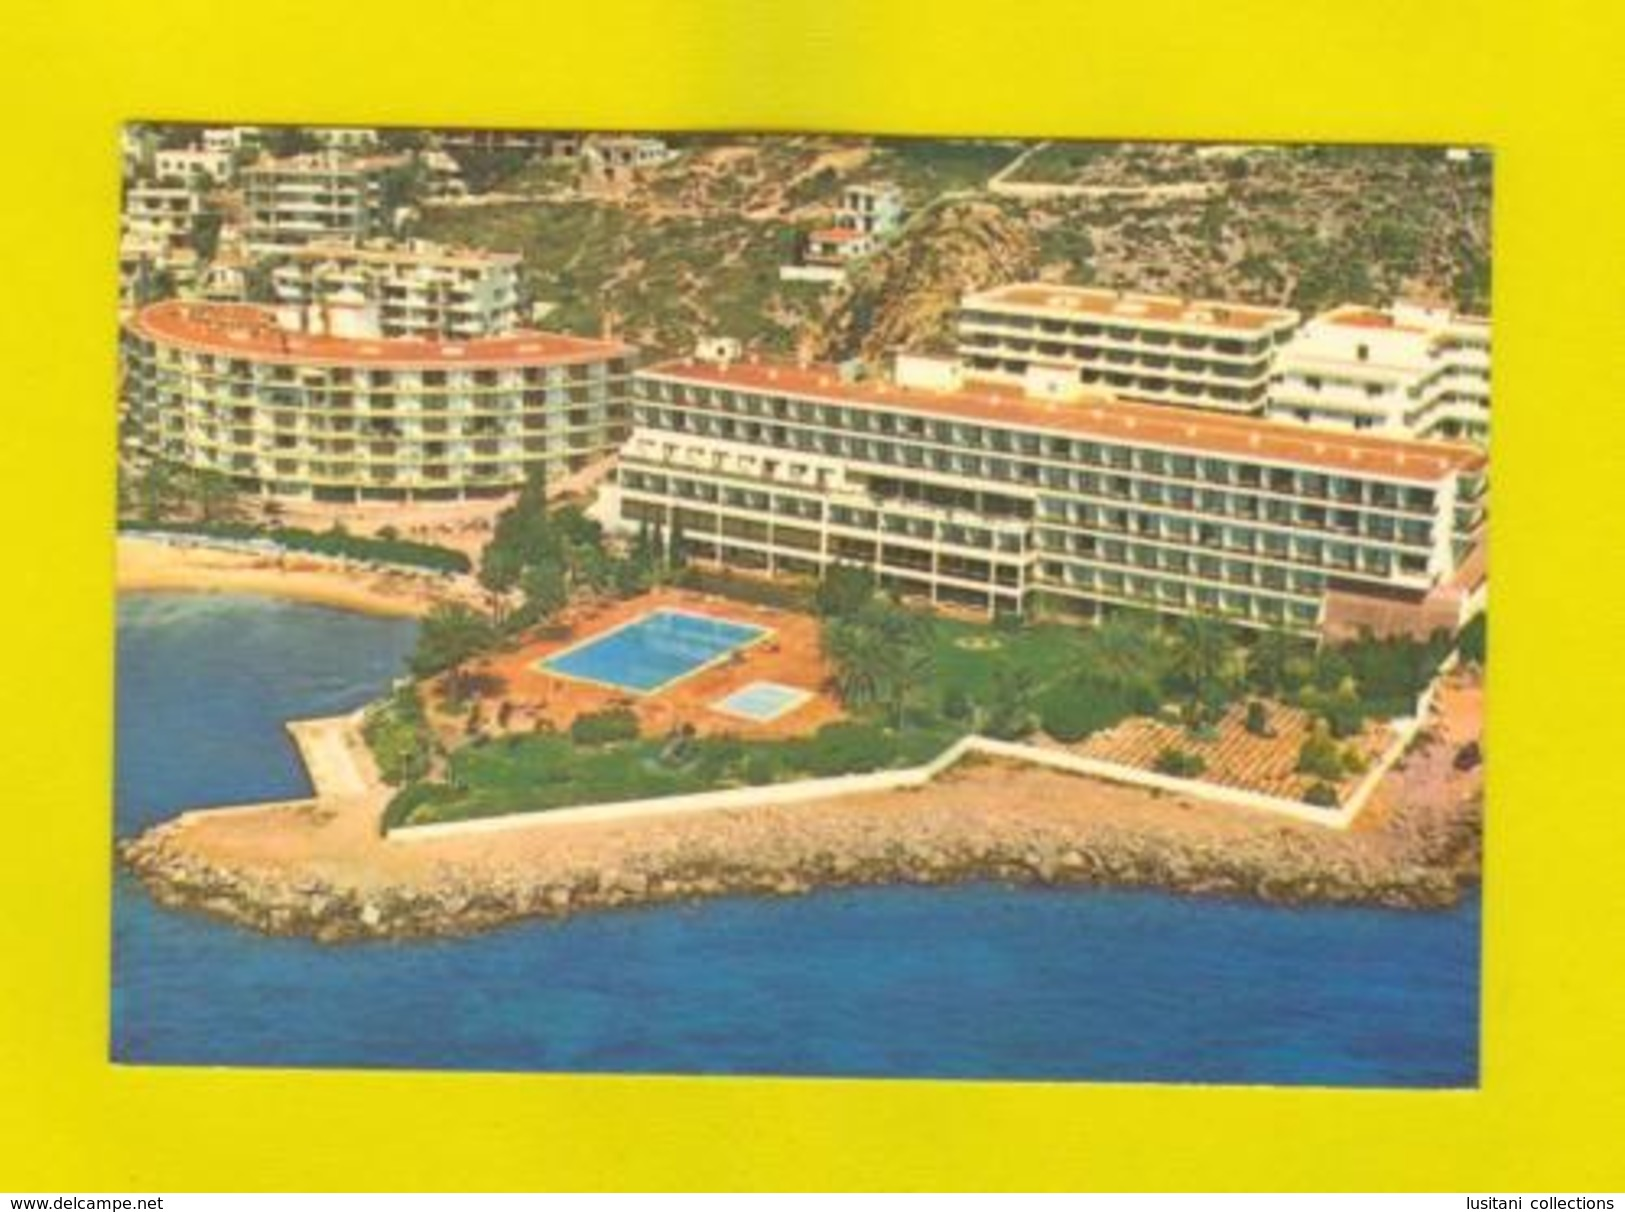 IBIZA Postcard 1970 Years HOTEL HOTELS SPAIN ESPAÑA - Postcards